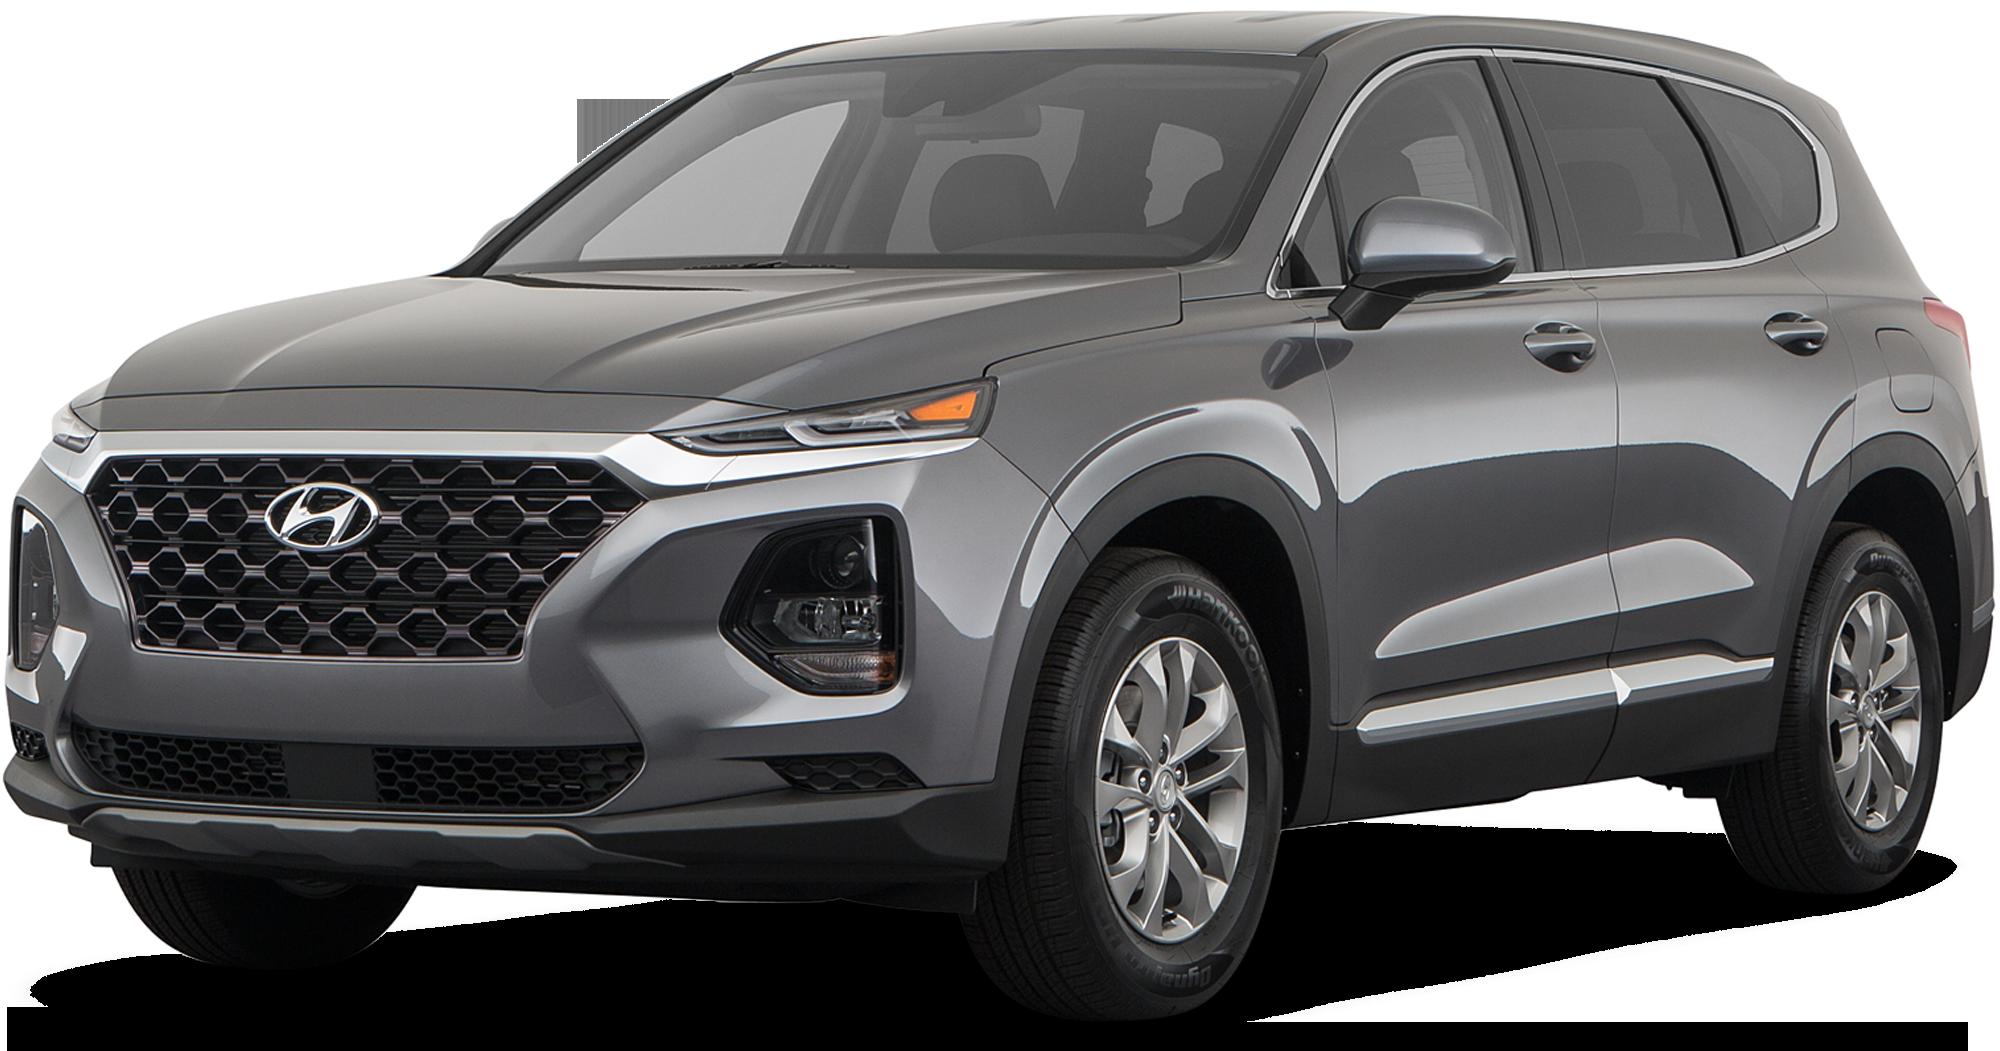 2020 Hyundai Santa Fe Incentives Specials Offers In New Bern Nc